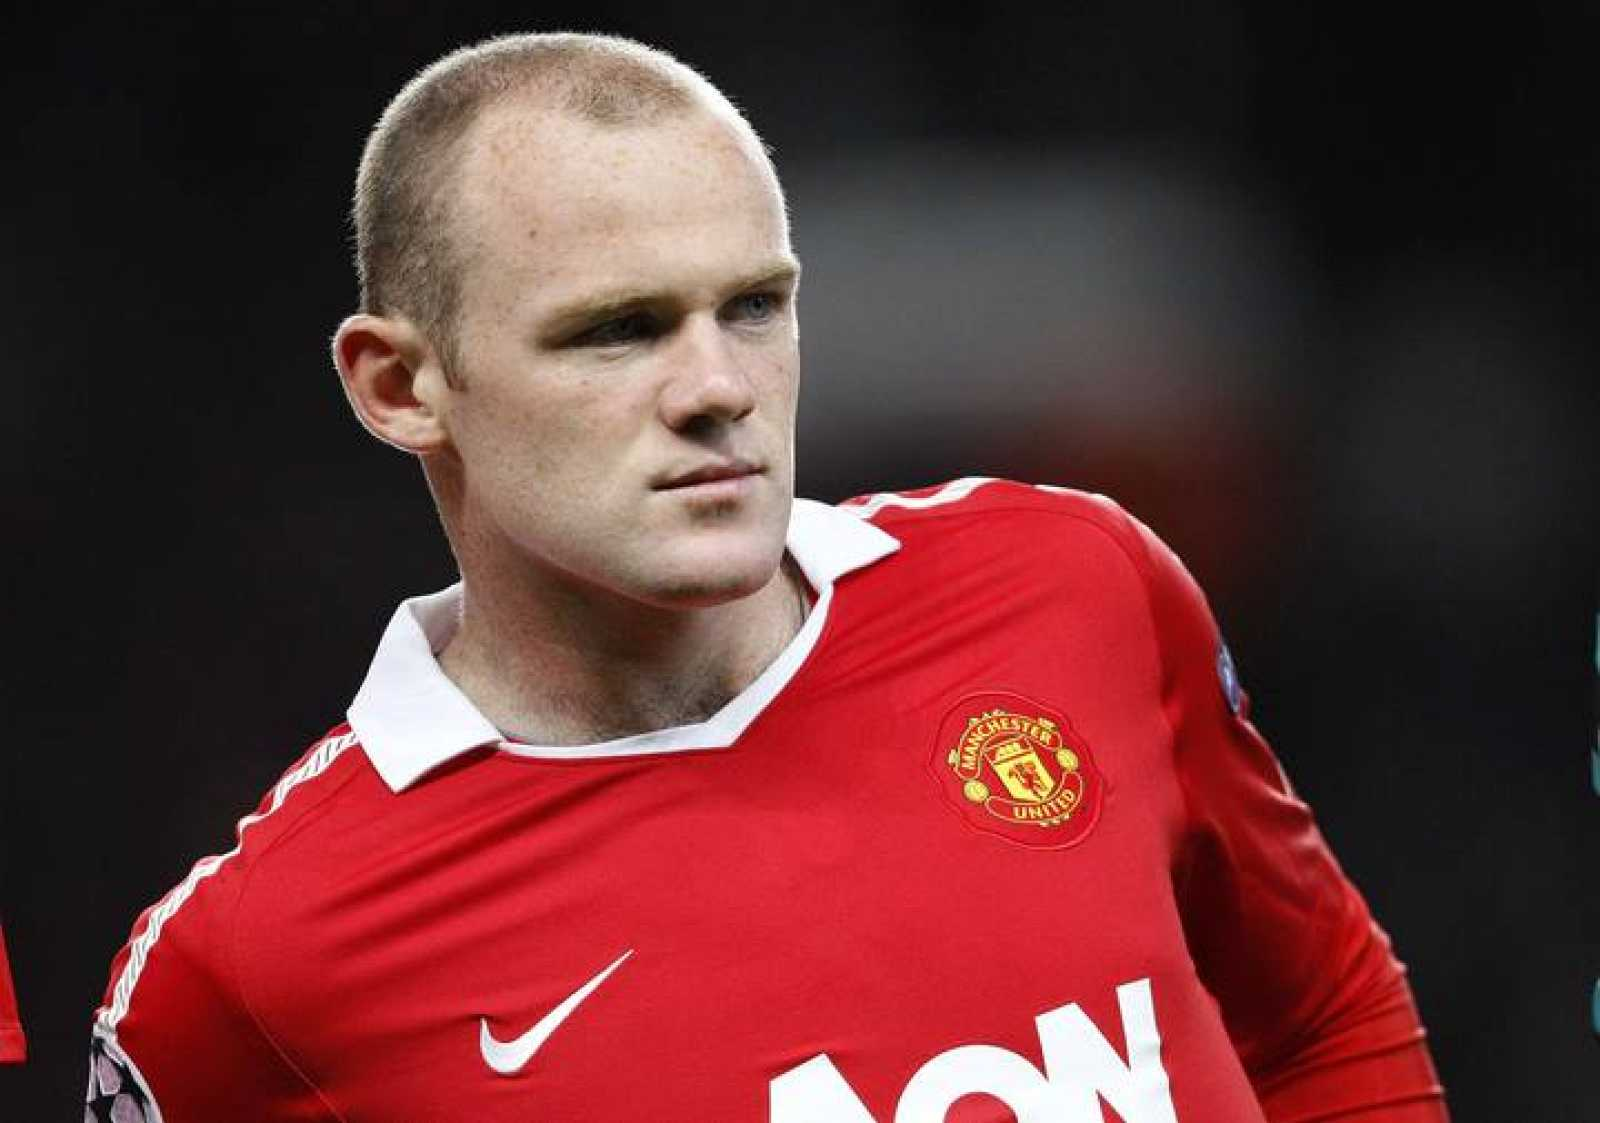 Se retira el mítico futbolista del Manchester United Wayne Rooney